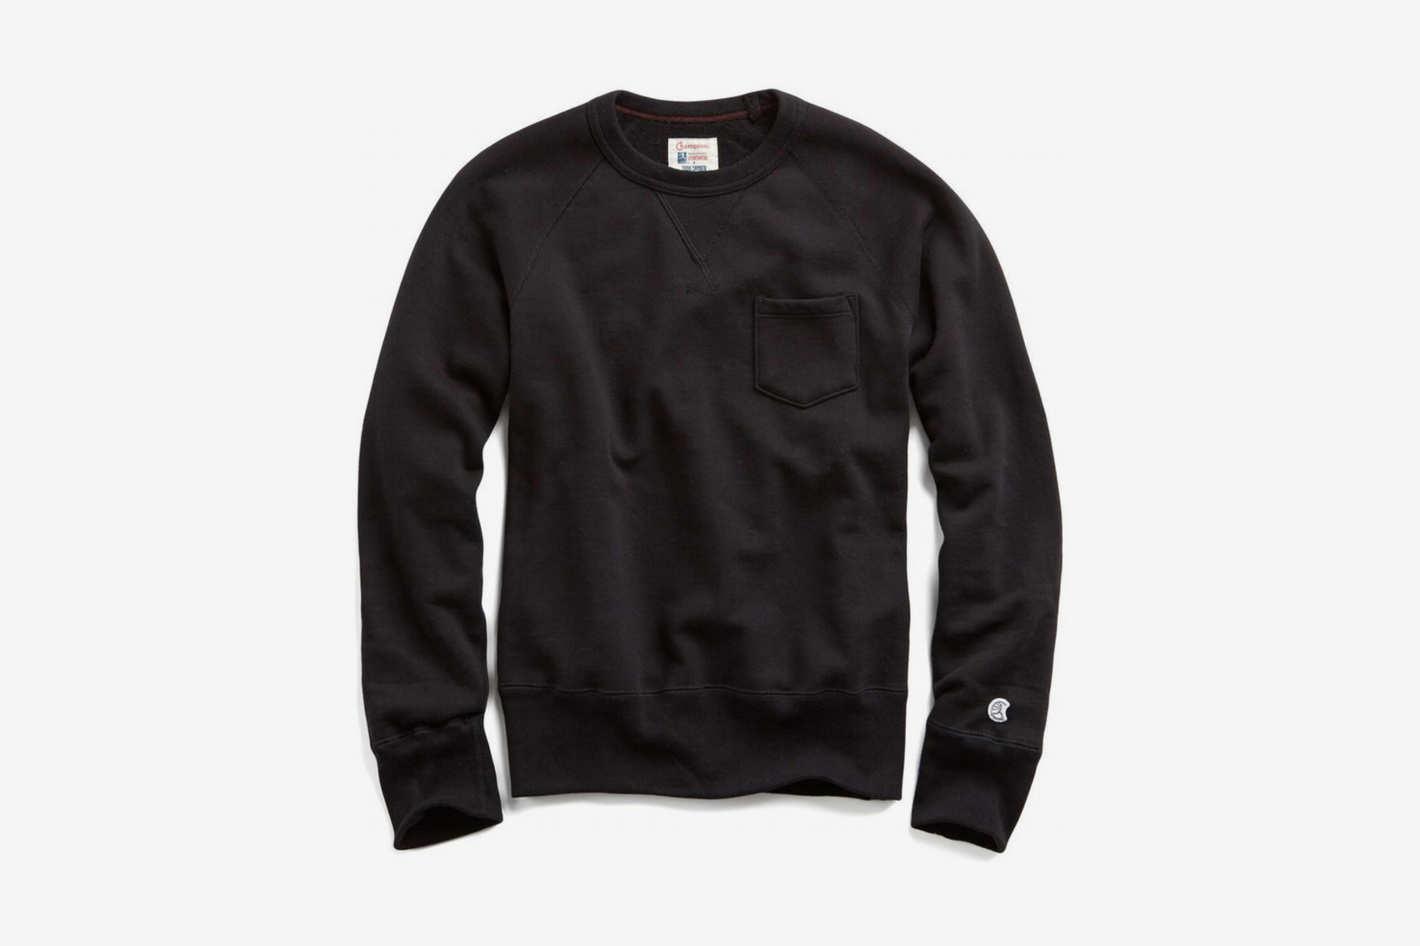 Todd Snyder + Champion Classic Pocket Sweatshirt